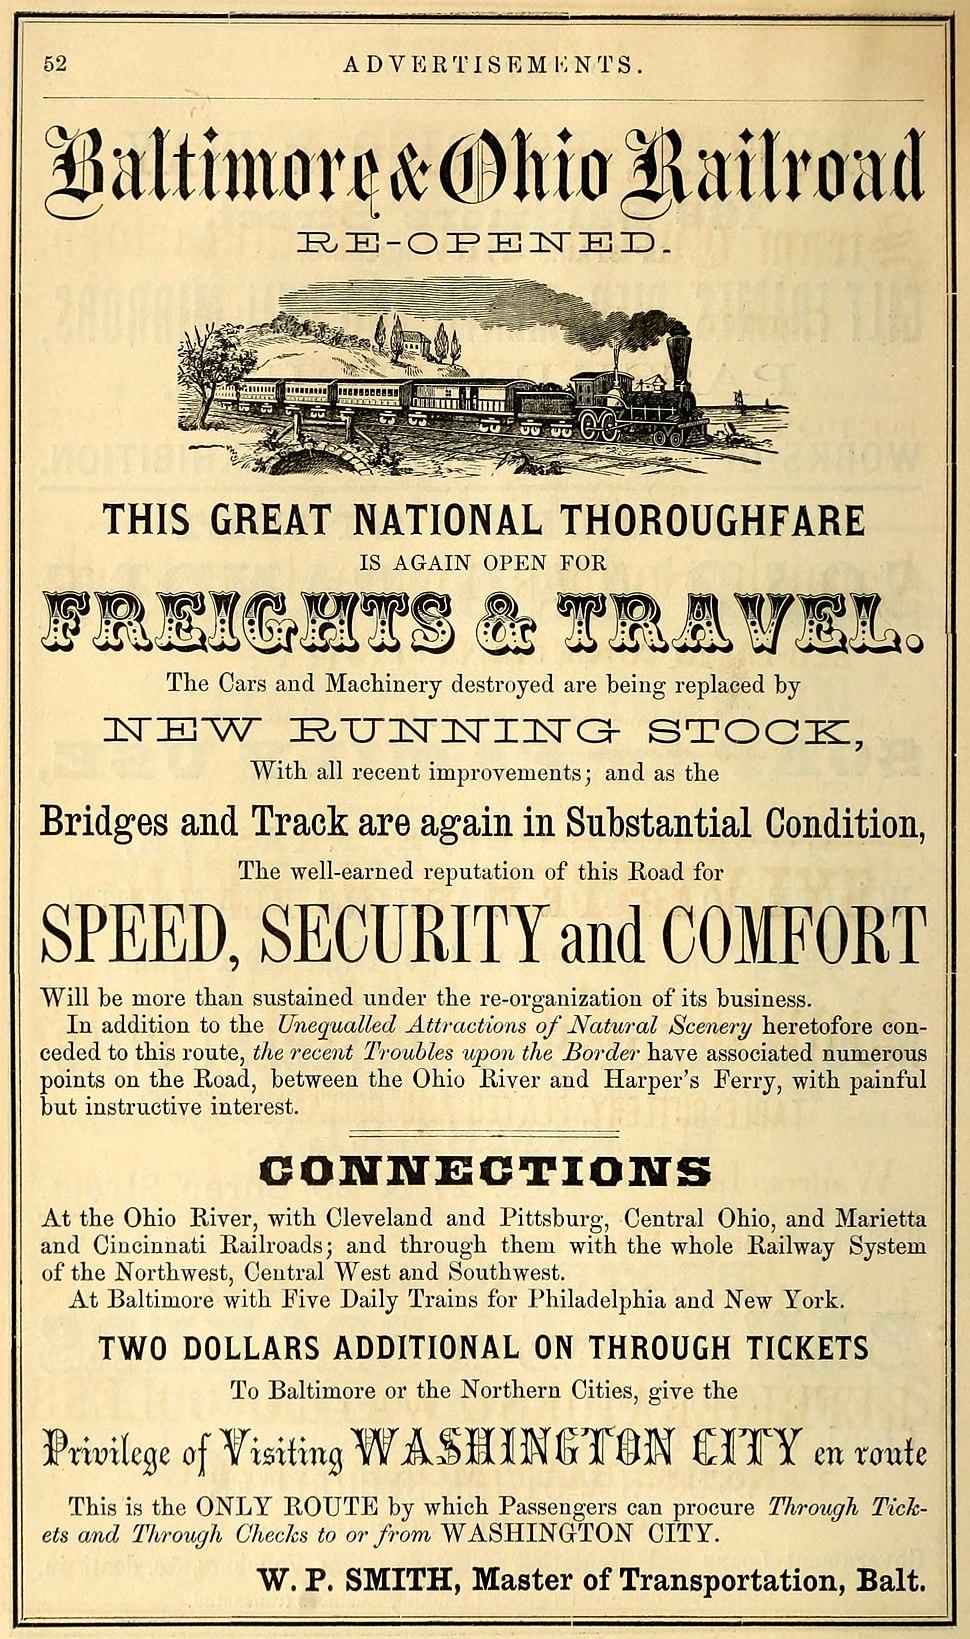 Woods%27 Baltimore City Directory - 1864 - Baltimore and Ohio Railroad.jpg